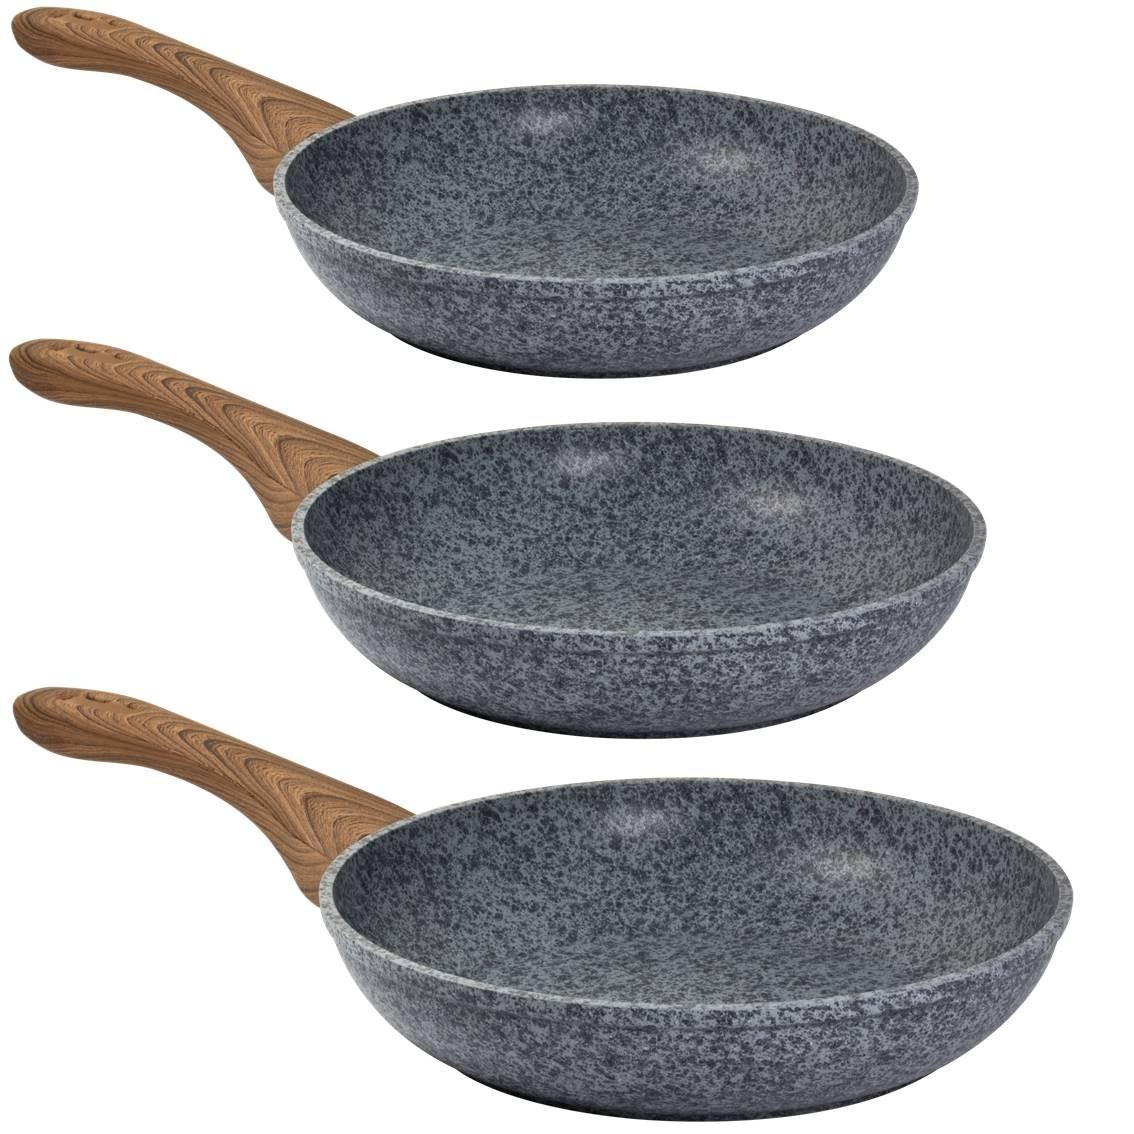 STEINFURT 3 - tlg Pfannenset, Granit - Grau